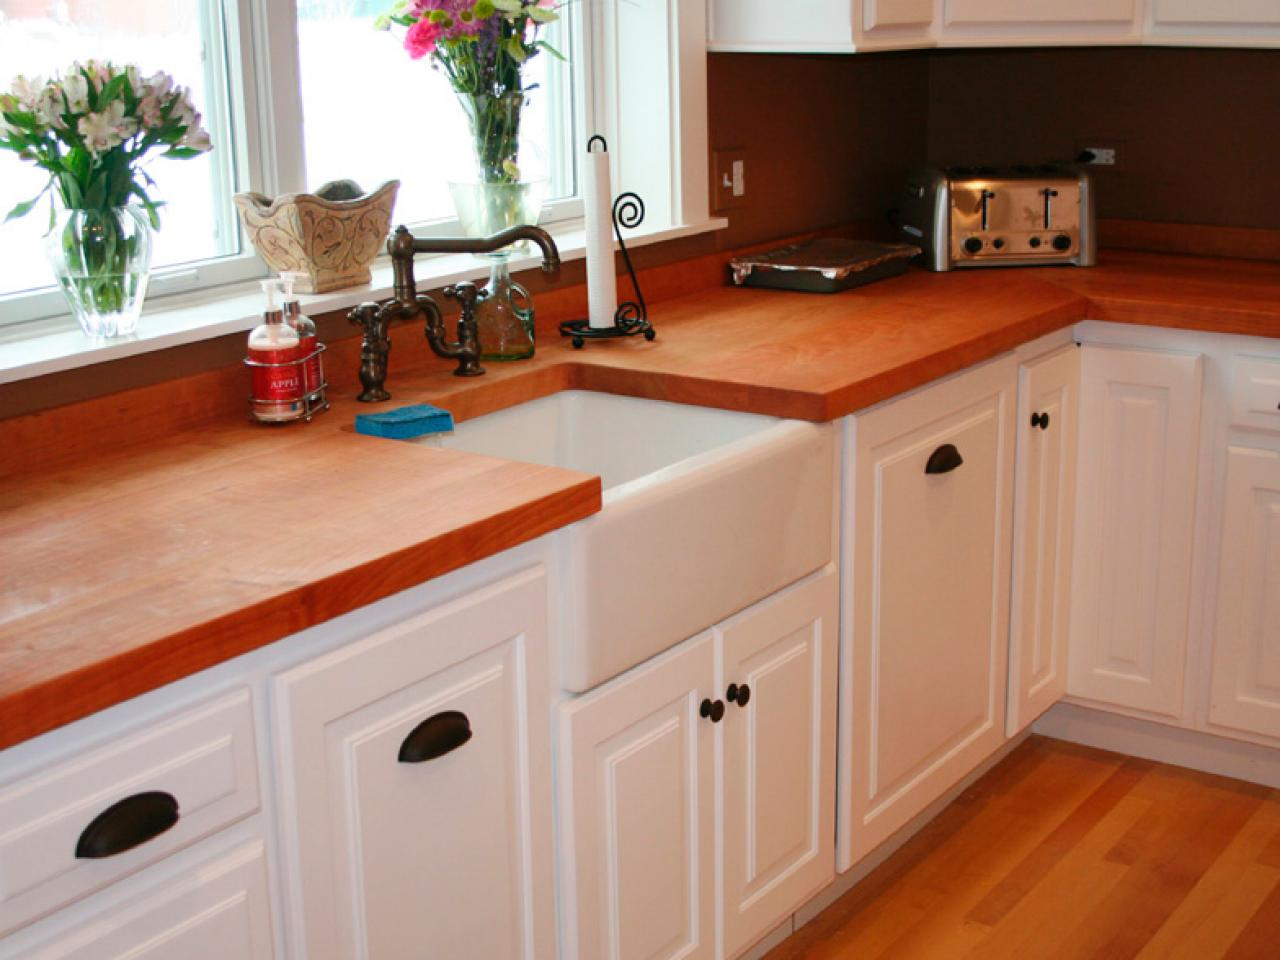 kitchen hardware wall mounted shelves cabinet trends waukesha wi schoenwalder plumbing